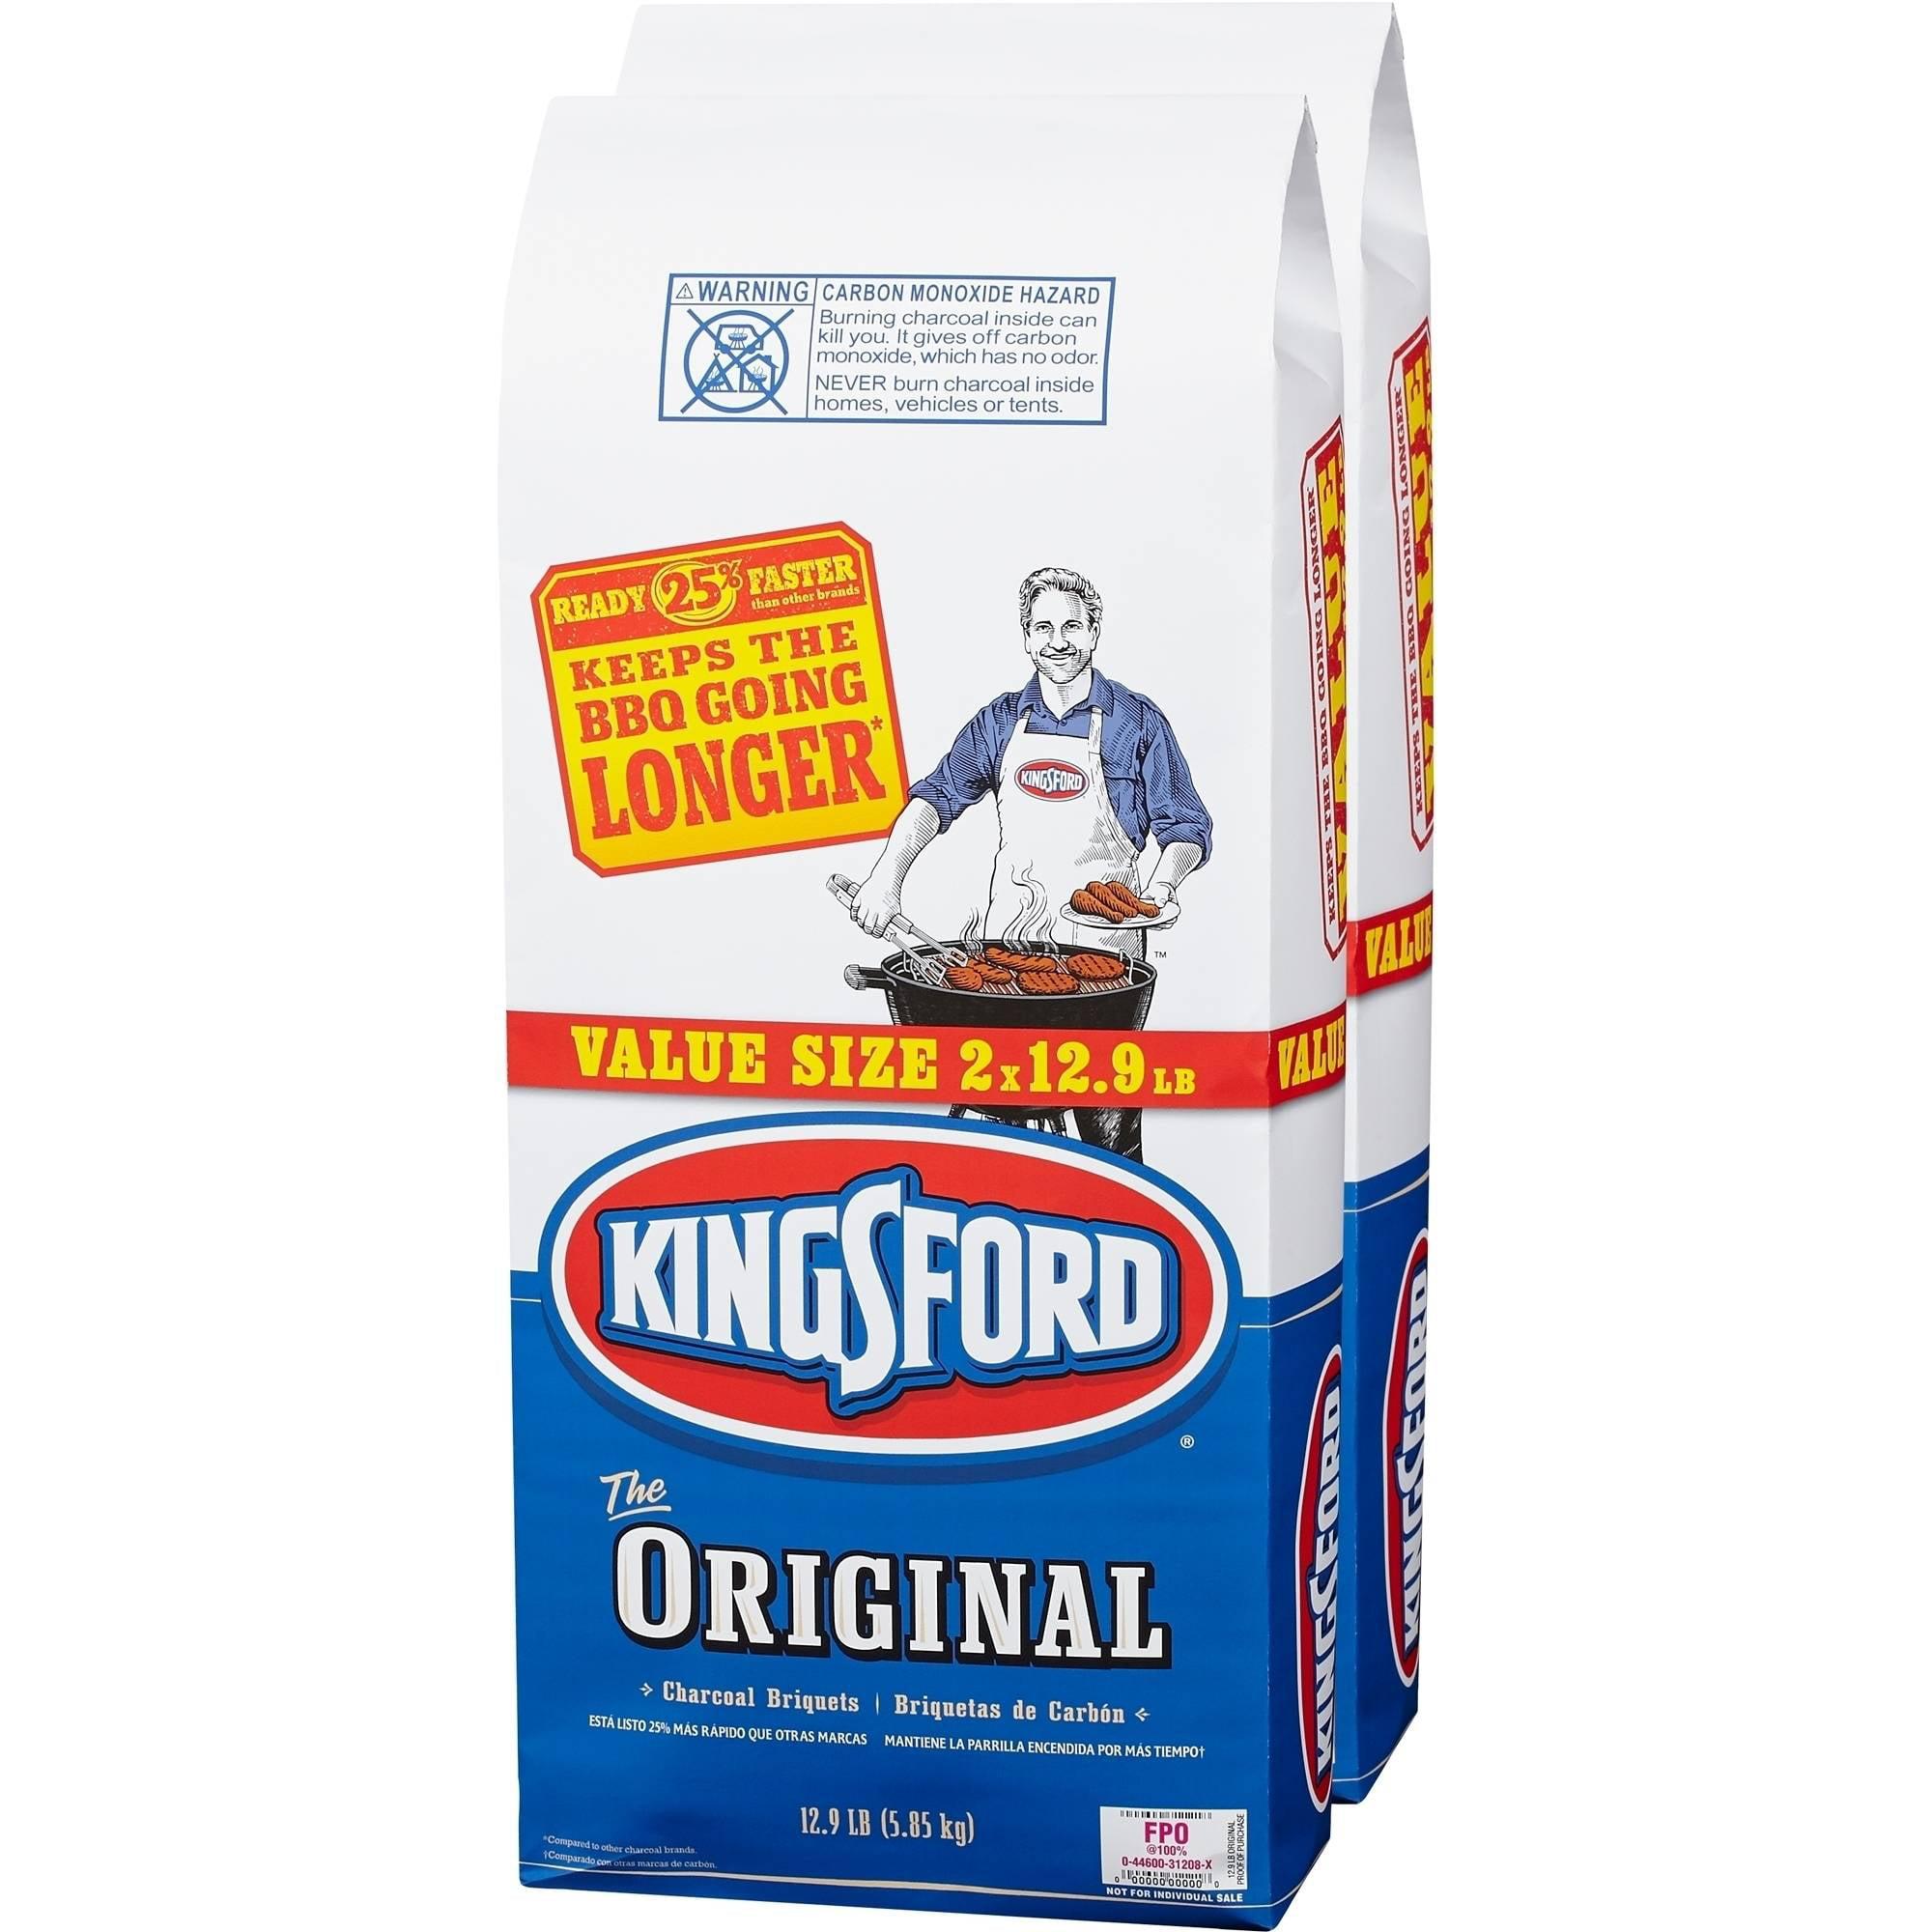 Kingsford Charcoal Briquets, Two 12.9 lb Bags